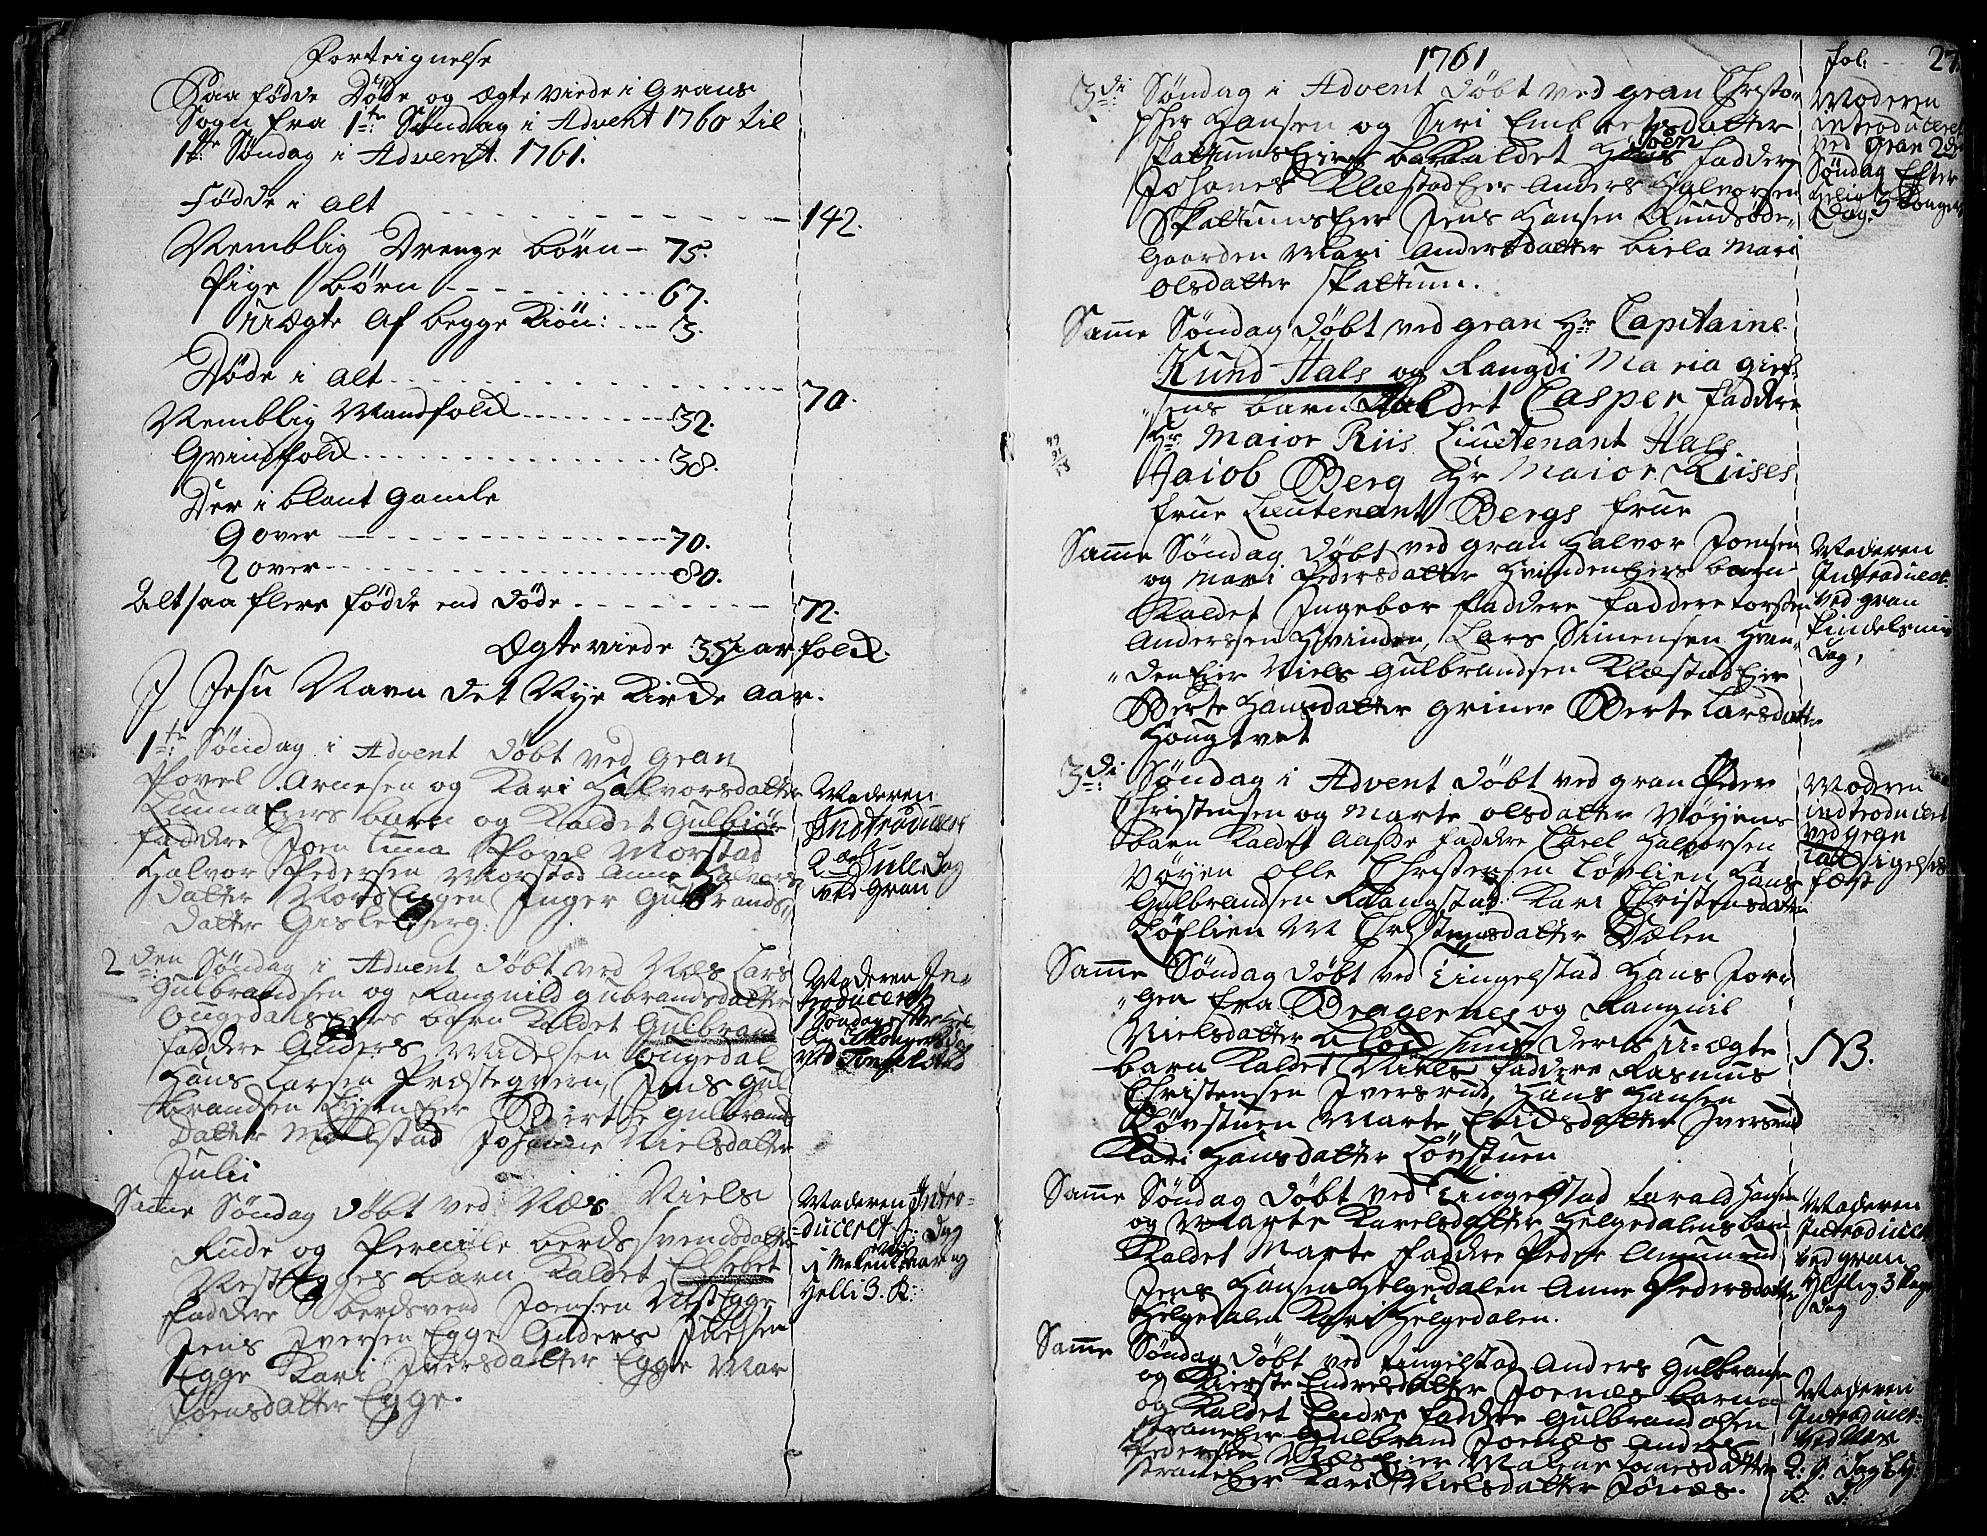 SAH, Gran prestekontor, Ministerialbok nr. 4, 1759-1775, s. 27